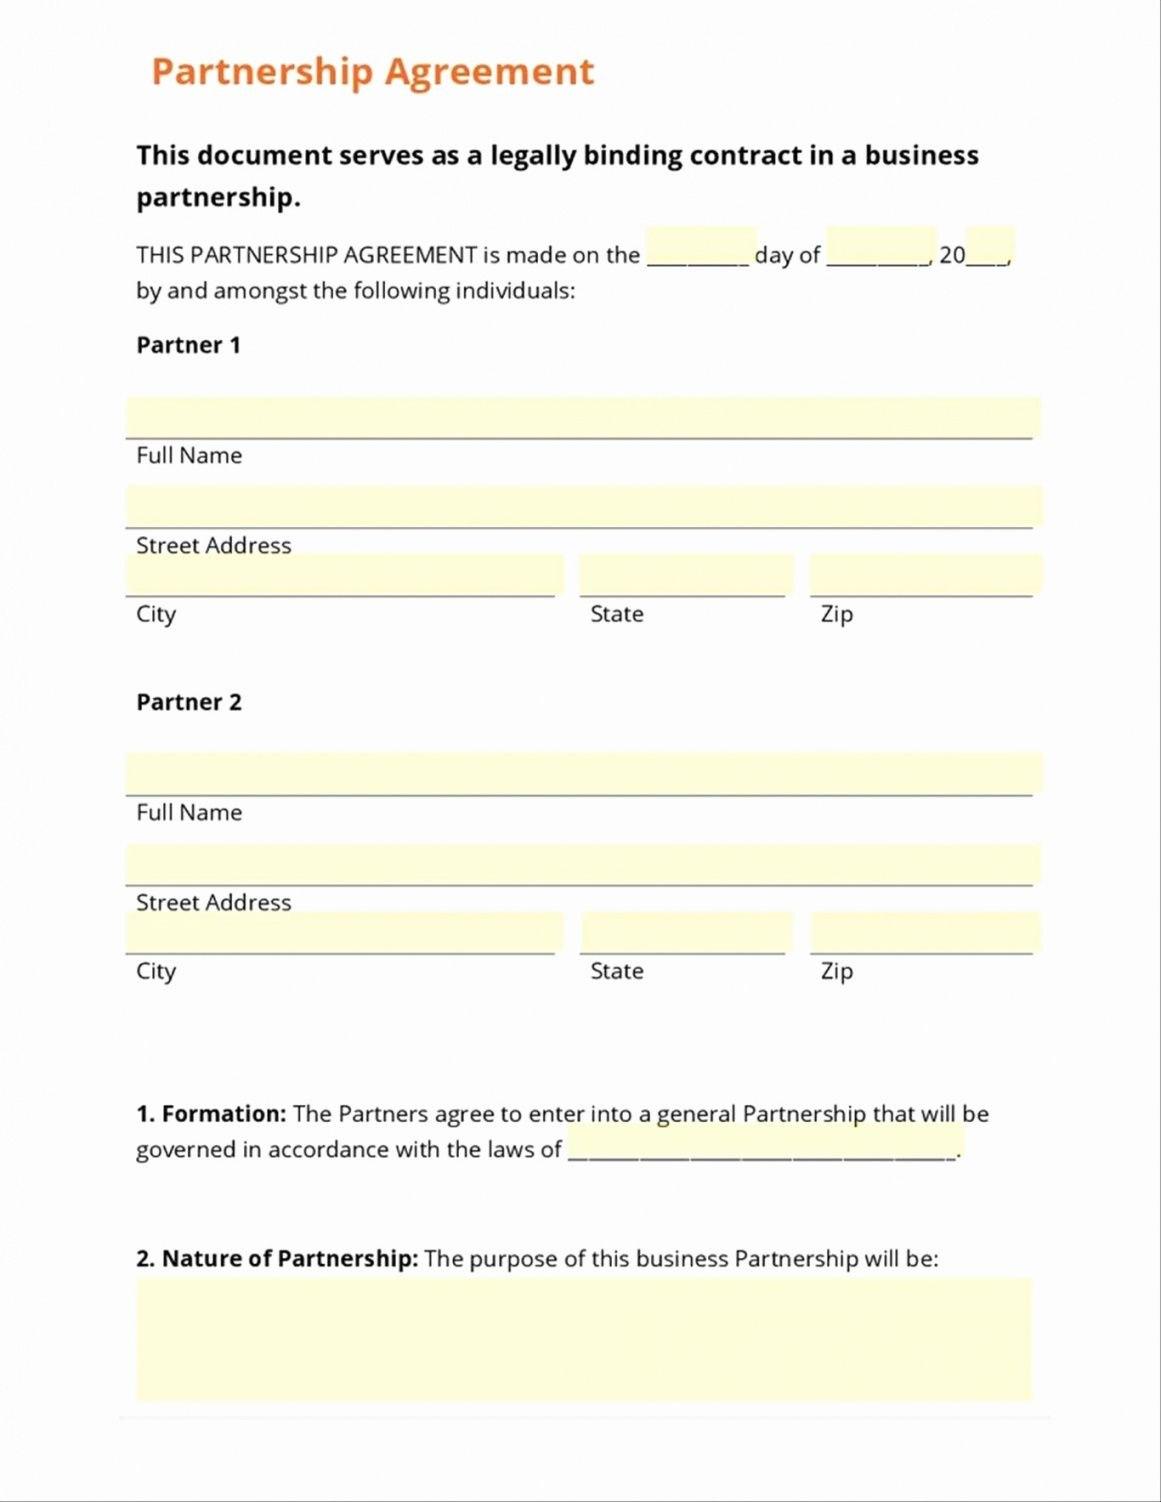 Partnership Agreement Template  Partnership Agreement Template Us In Business Contract Template For Partnership